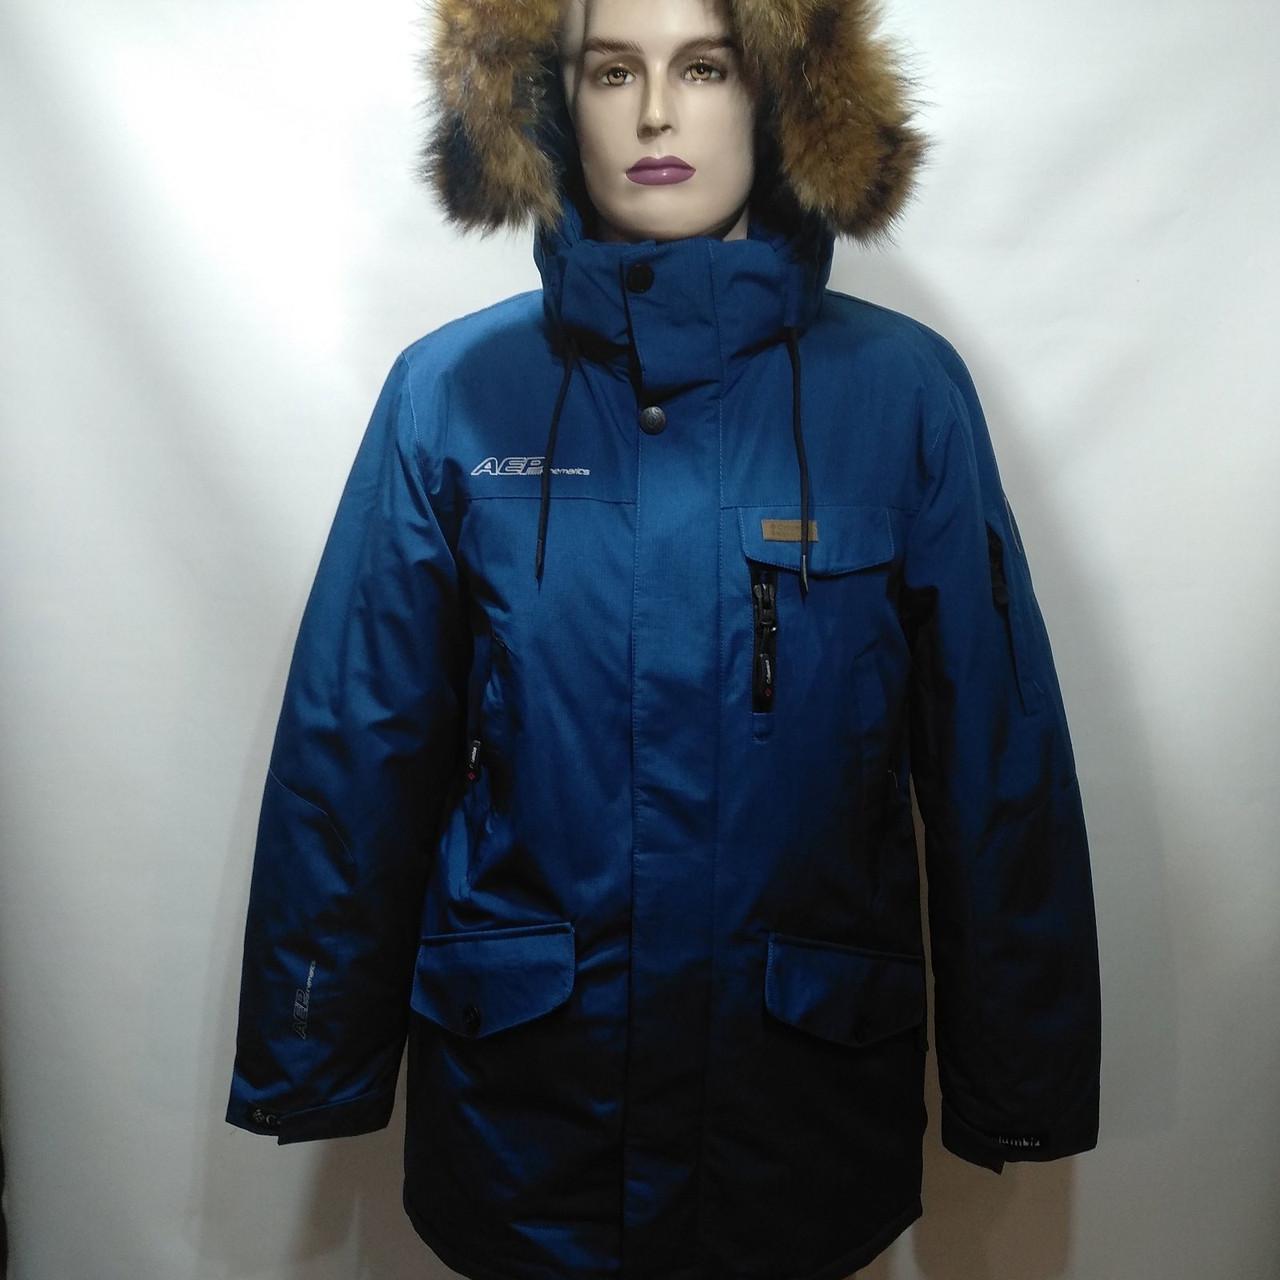 Куртка мужская зимняя Columbia / реплика Р. 52, 54